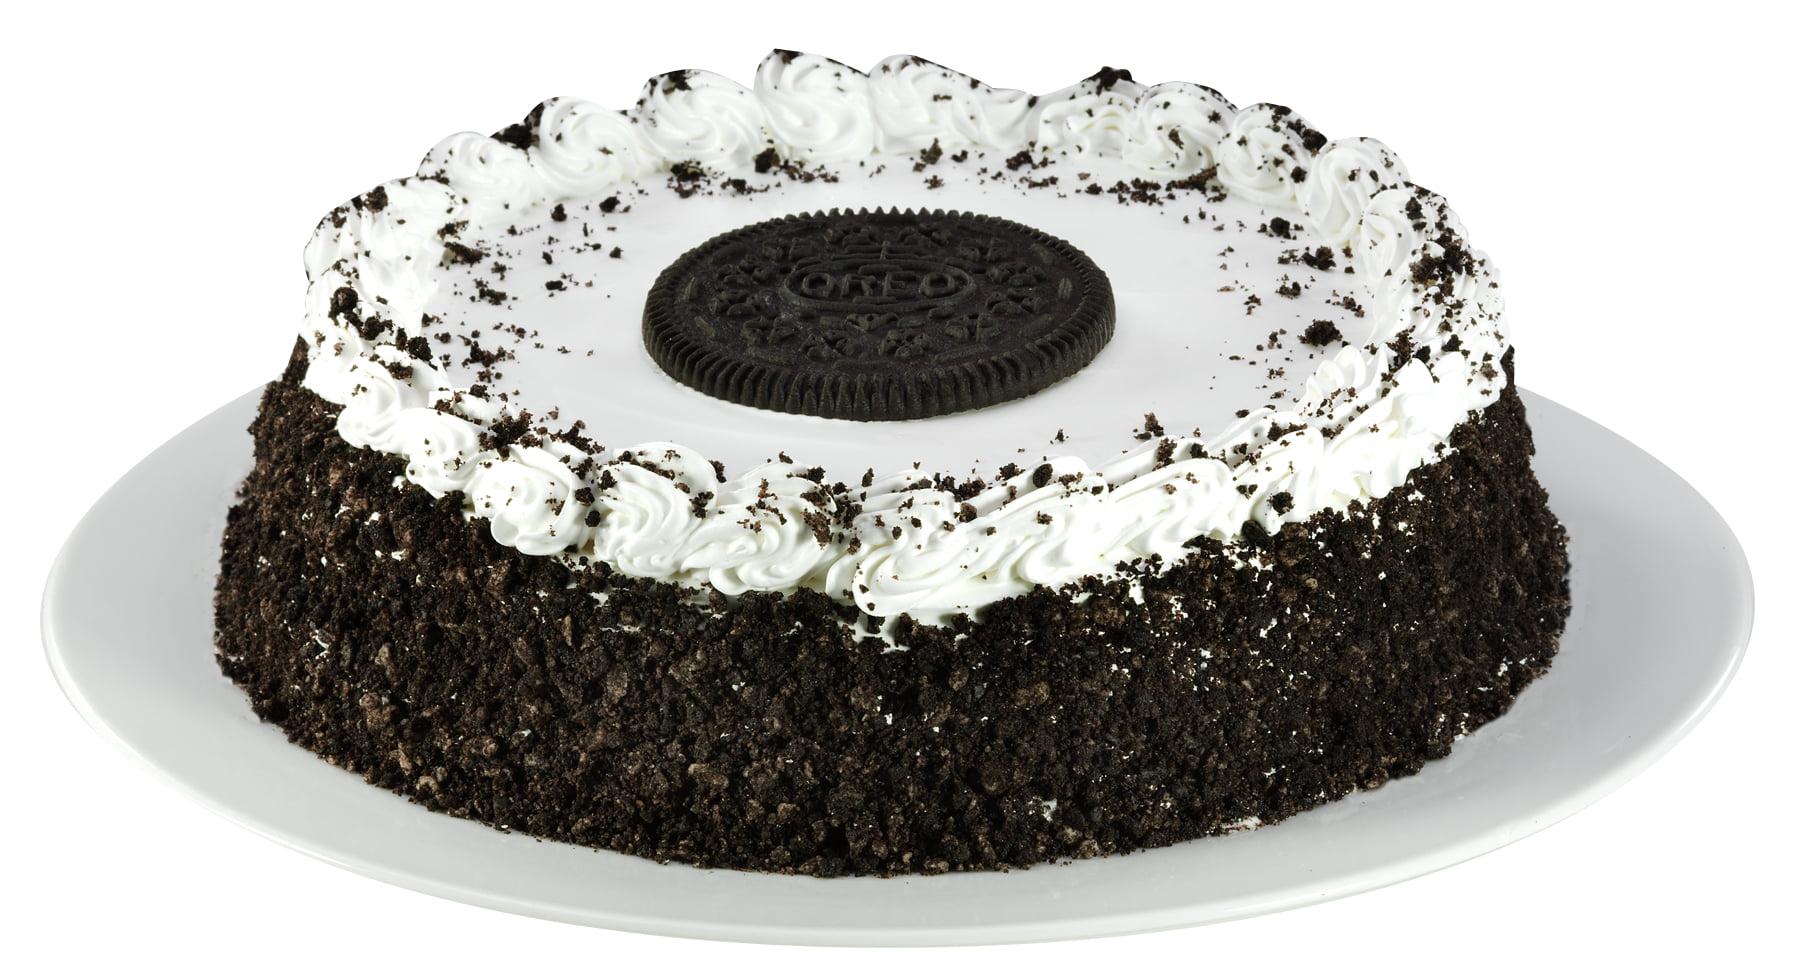 Oreo Premium Ice Cream Cake Made With Cookies And Vanilla 46 Oz